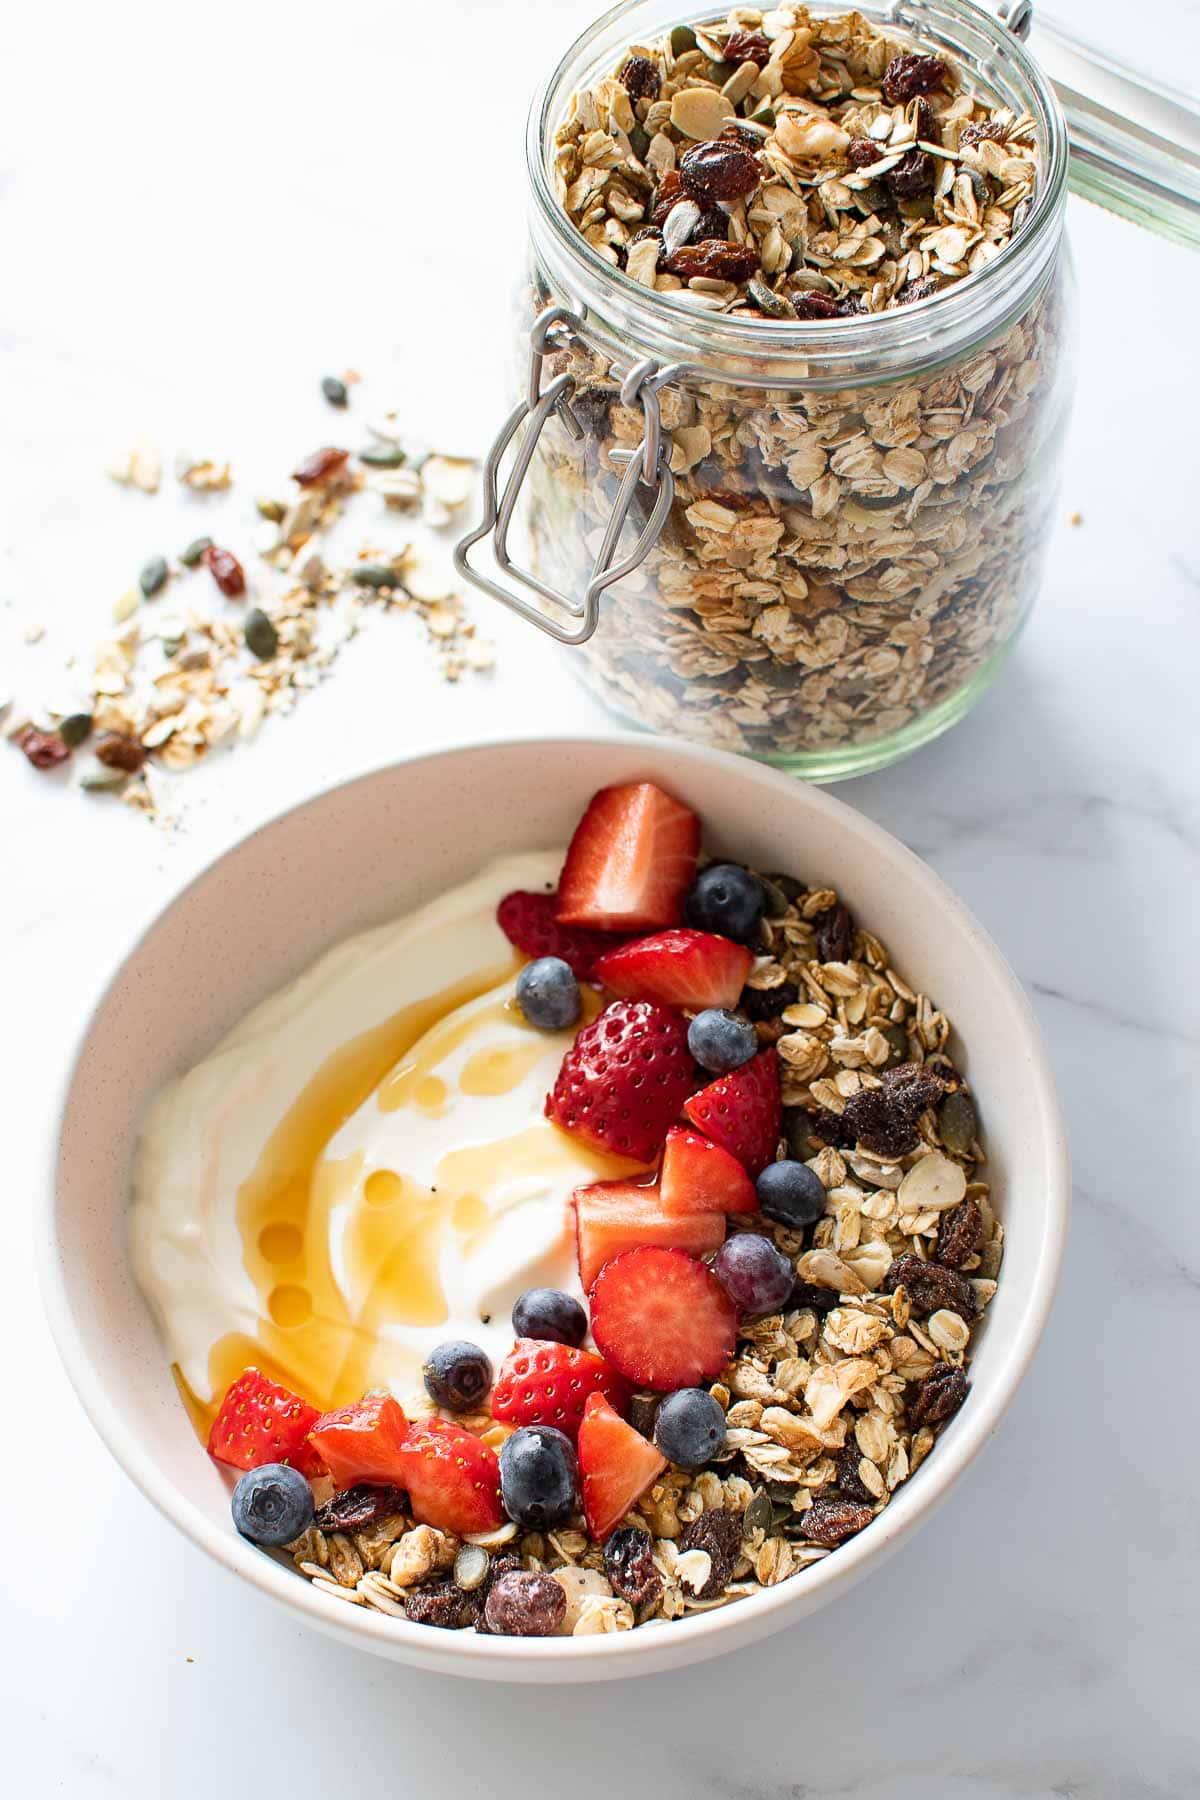 A yogurt bowl with muesli and berries.